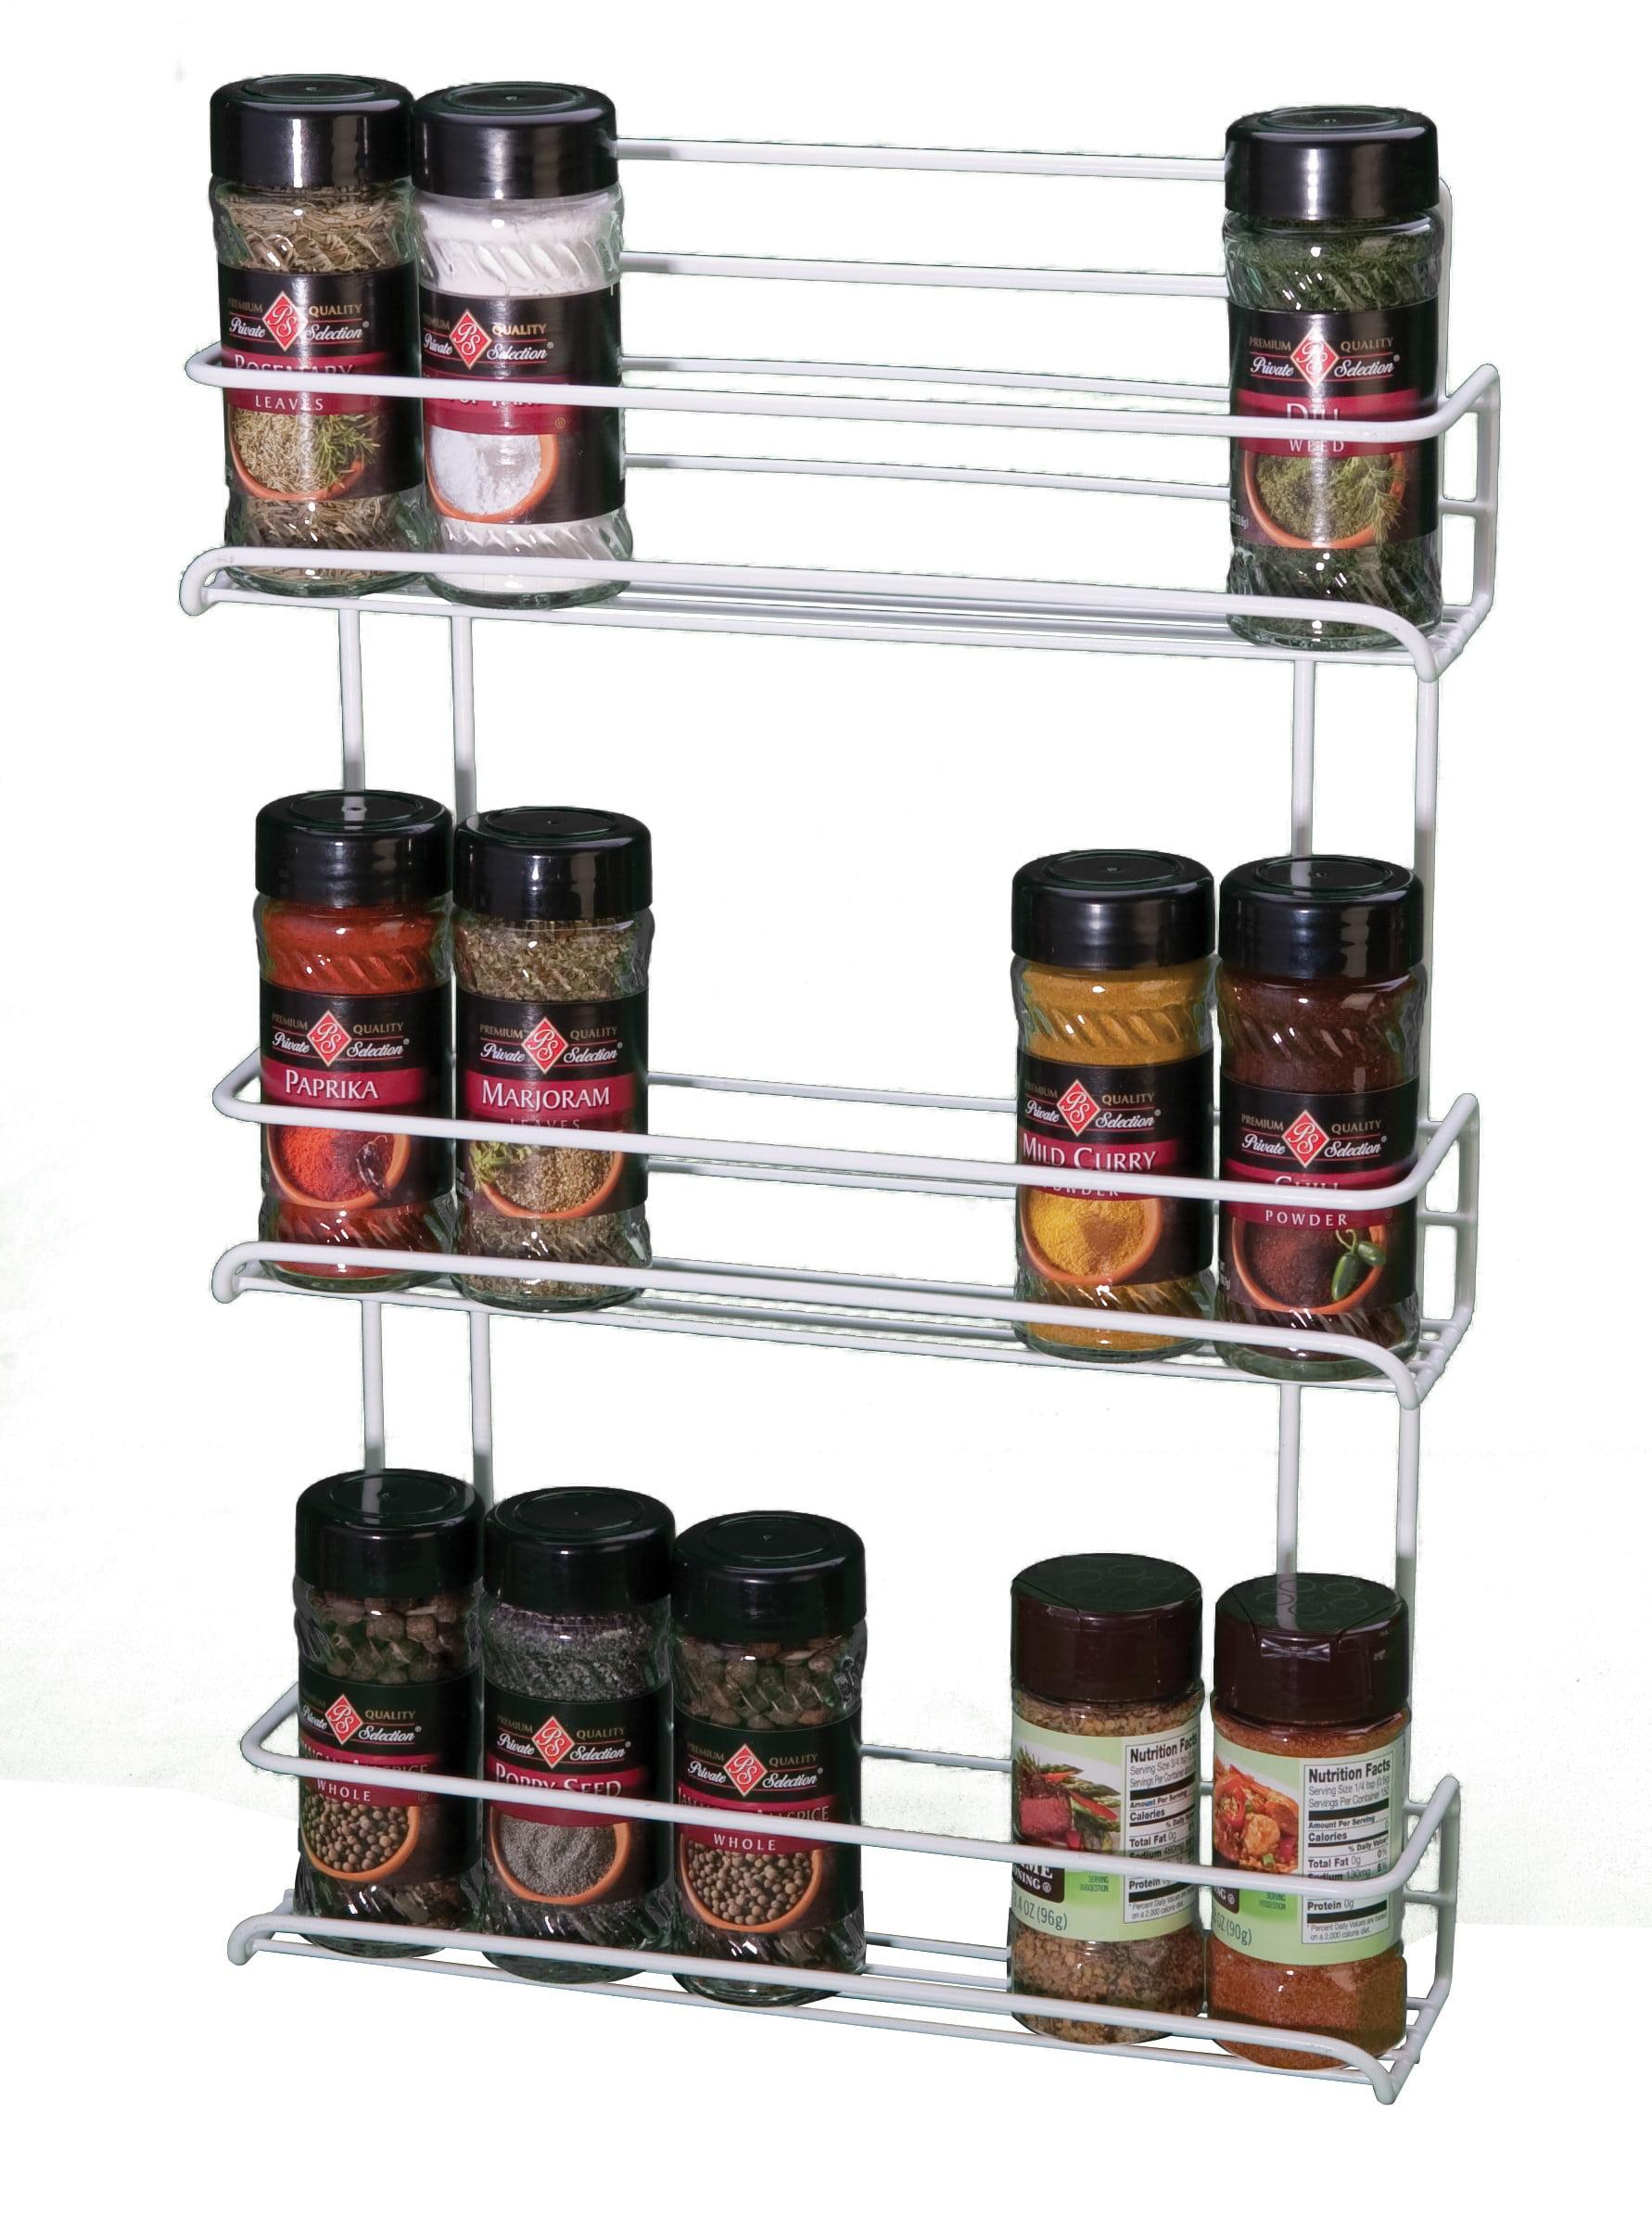 Panacea Gourmet Shelf Spice Rack with 3 Shelves, White by Panacea